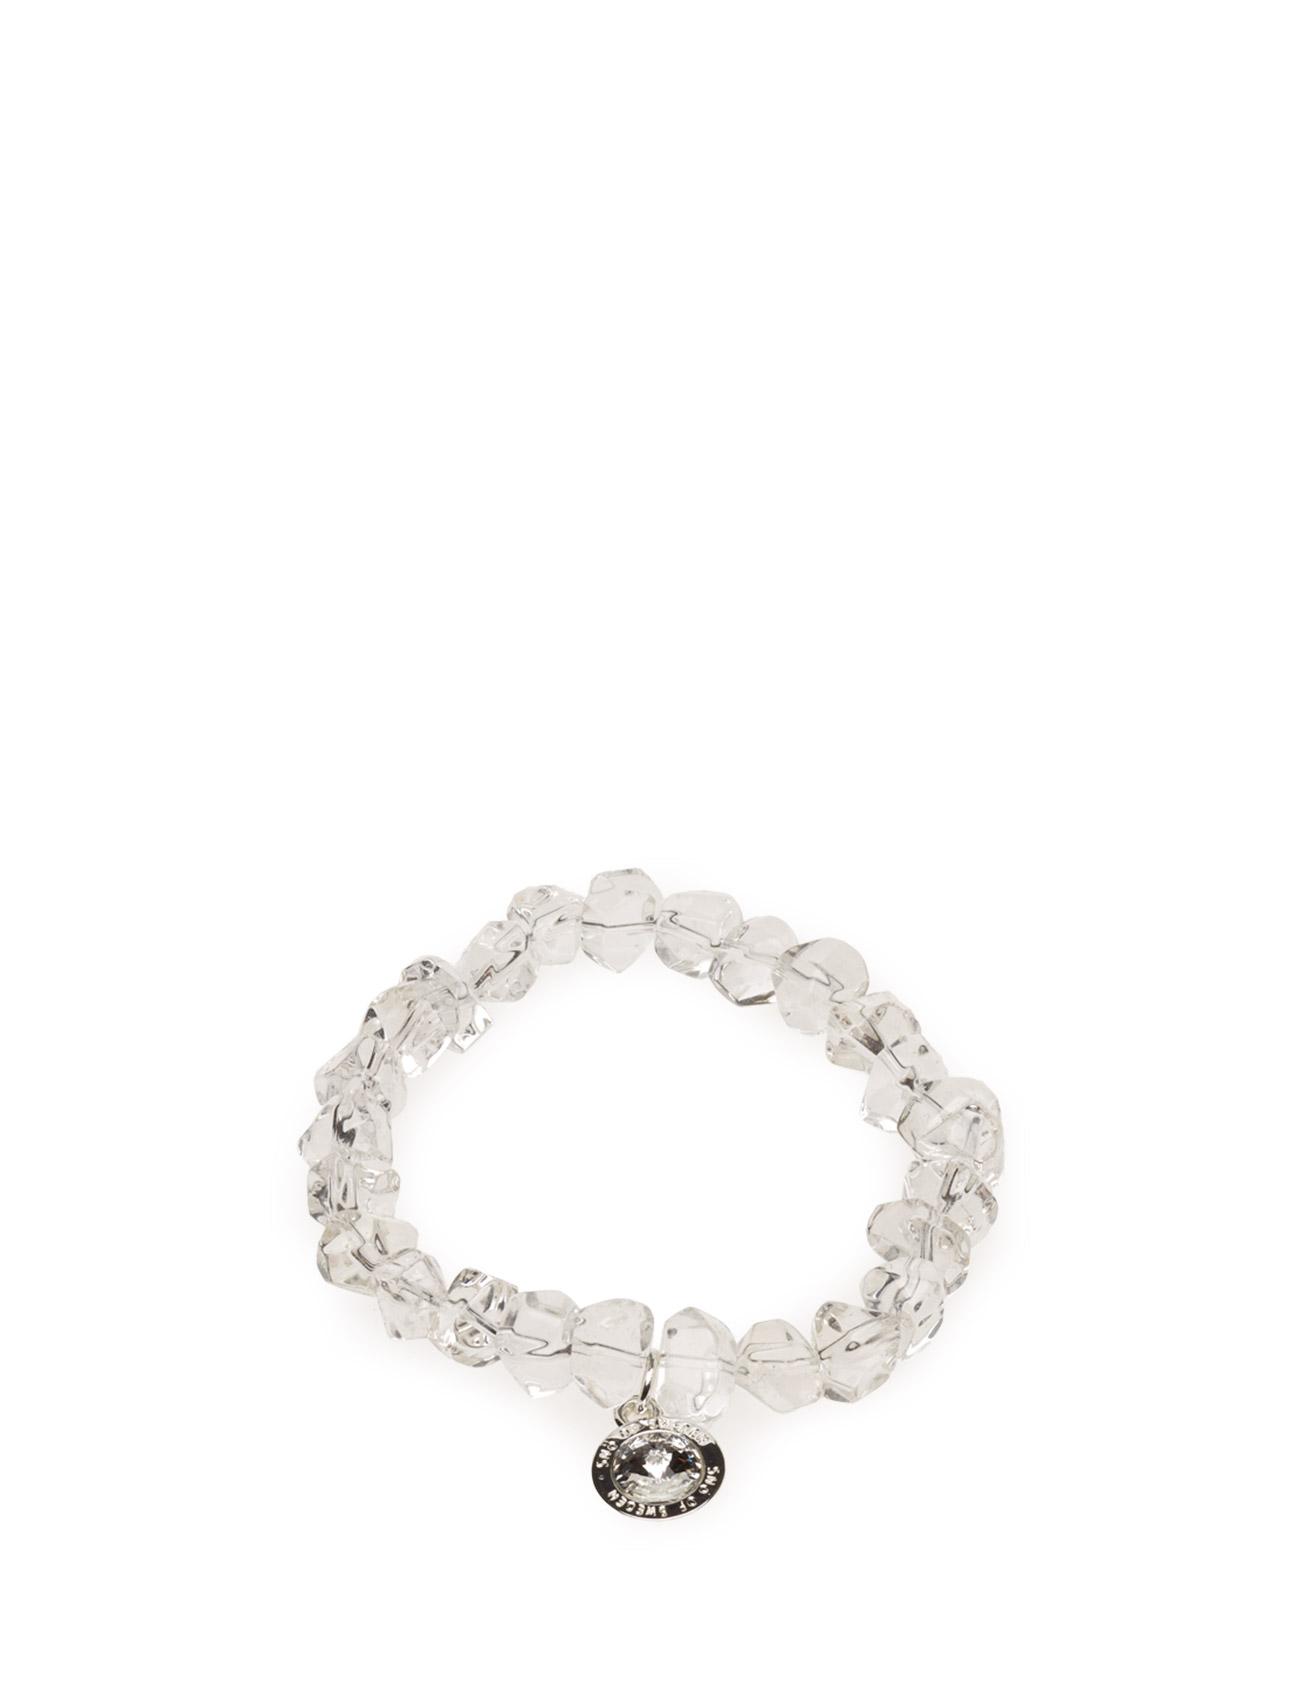 Sence Elastic Brace Silver/M SN… of Sweden Smykker til Kvinder i Sølv